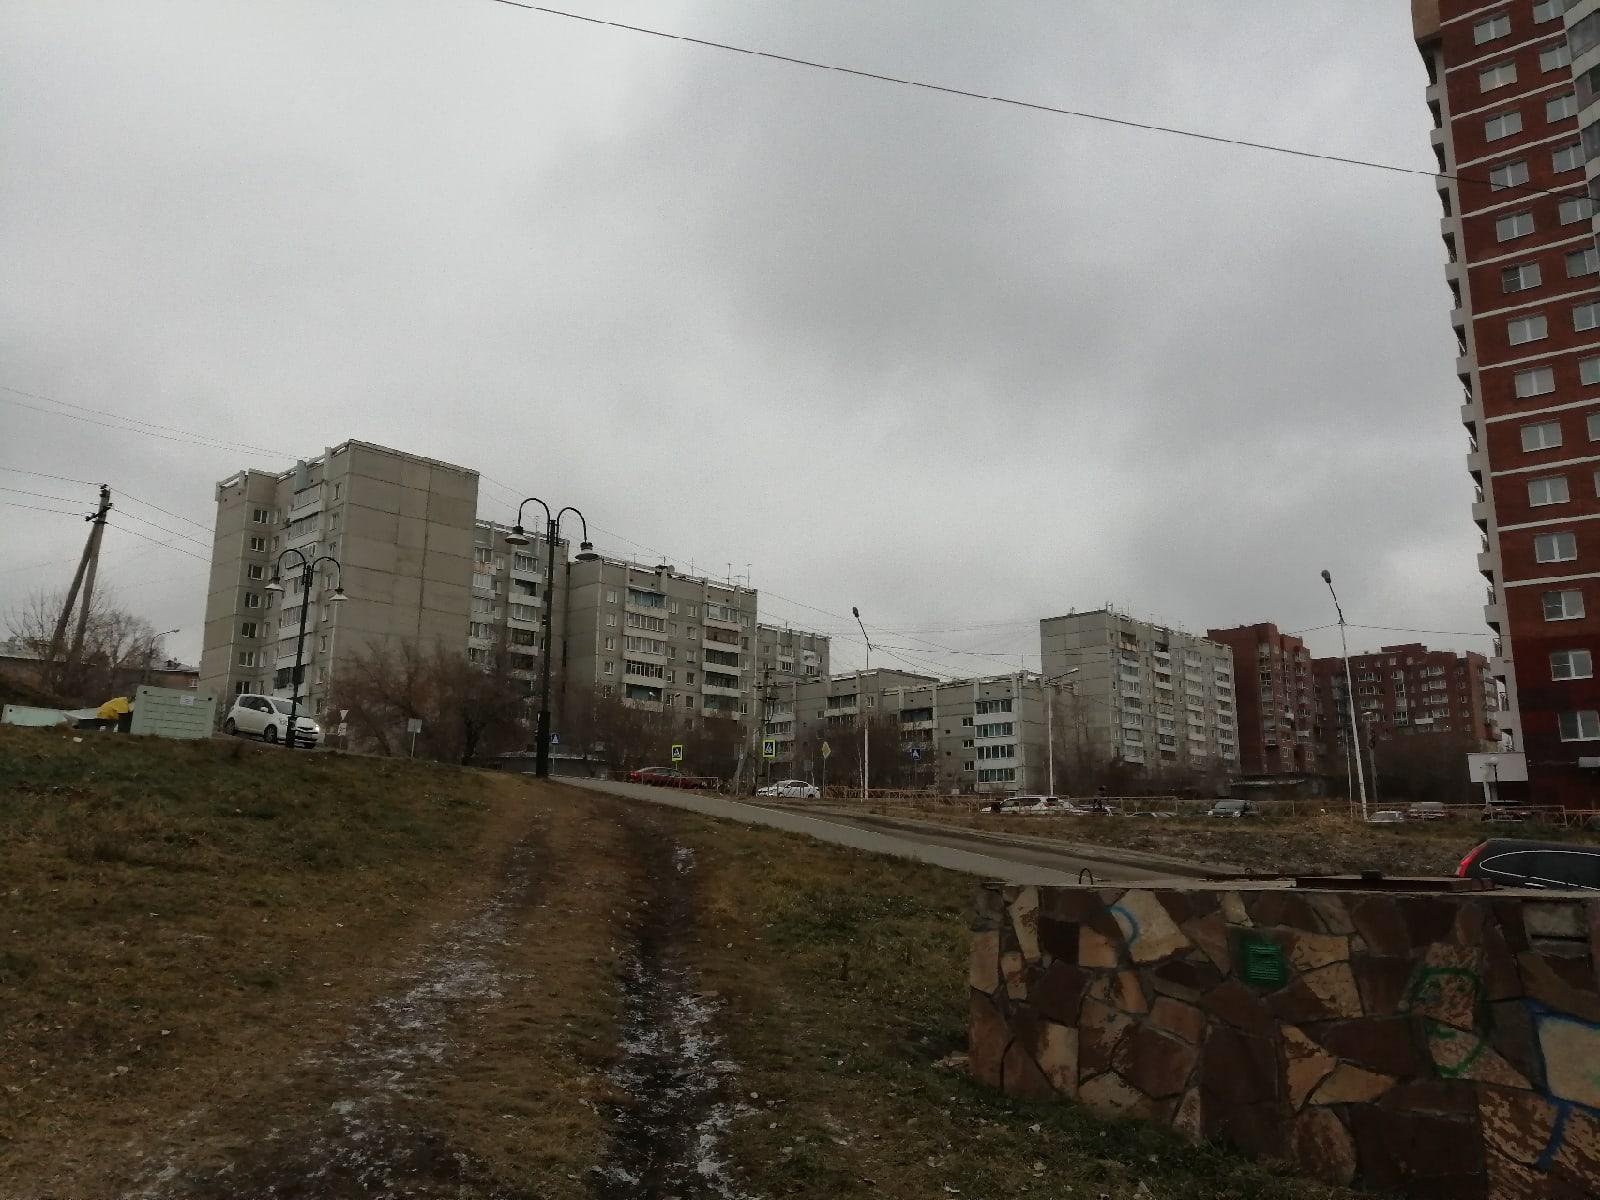 г. Иркутск, гуляли по любимым местам.